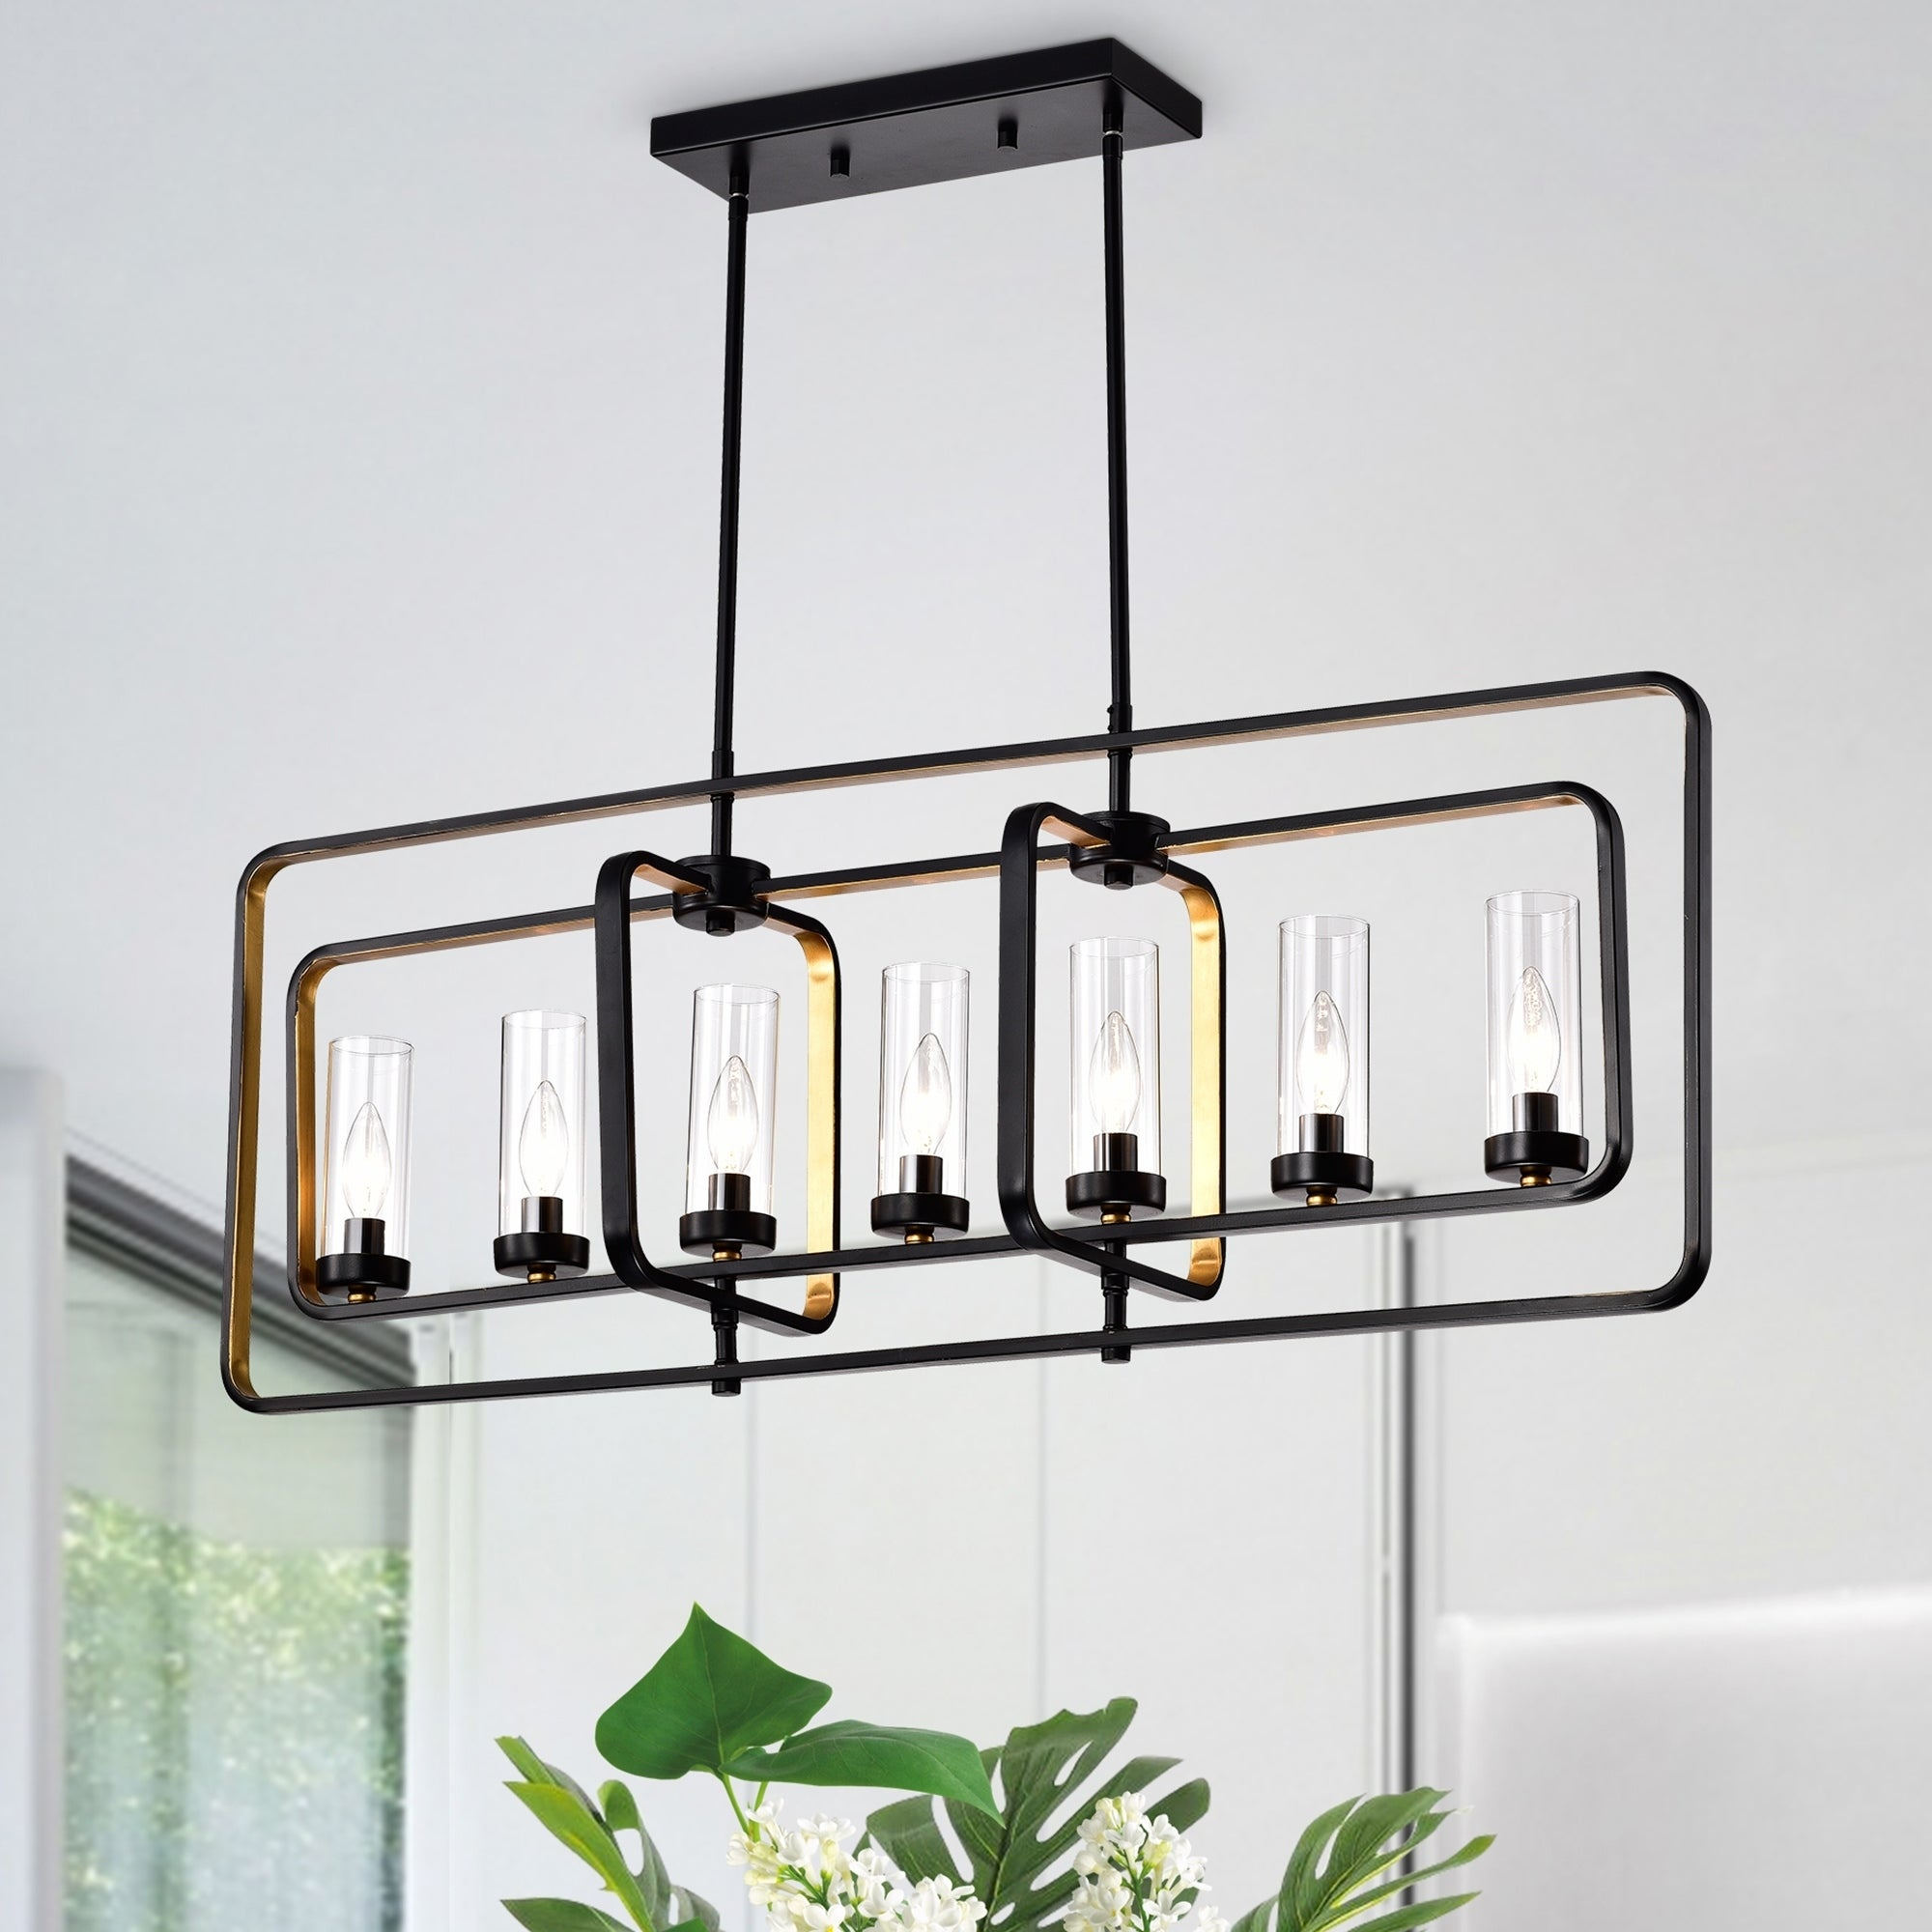 Shop Black Friday Deals On Belline Matte Black Gold 7 Light Chandelier With Glass Pillar Shades On Sale Overstock 26387290